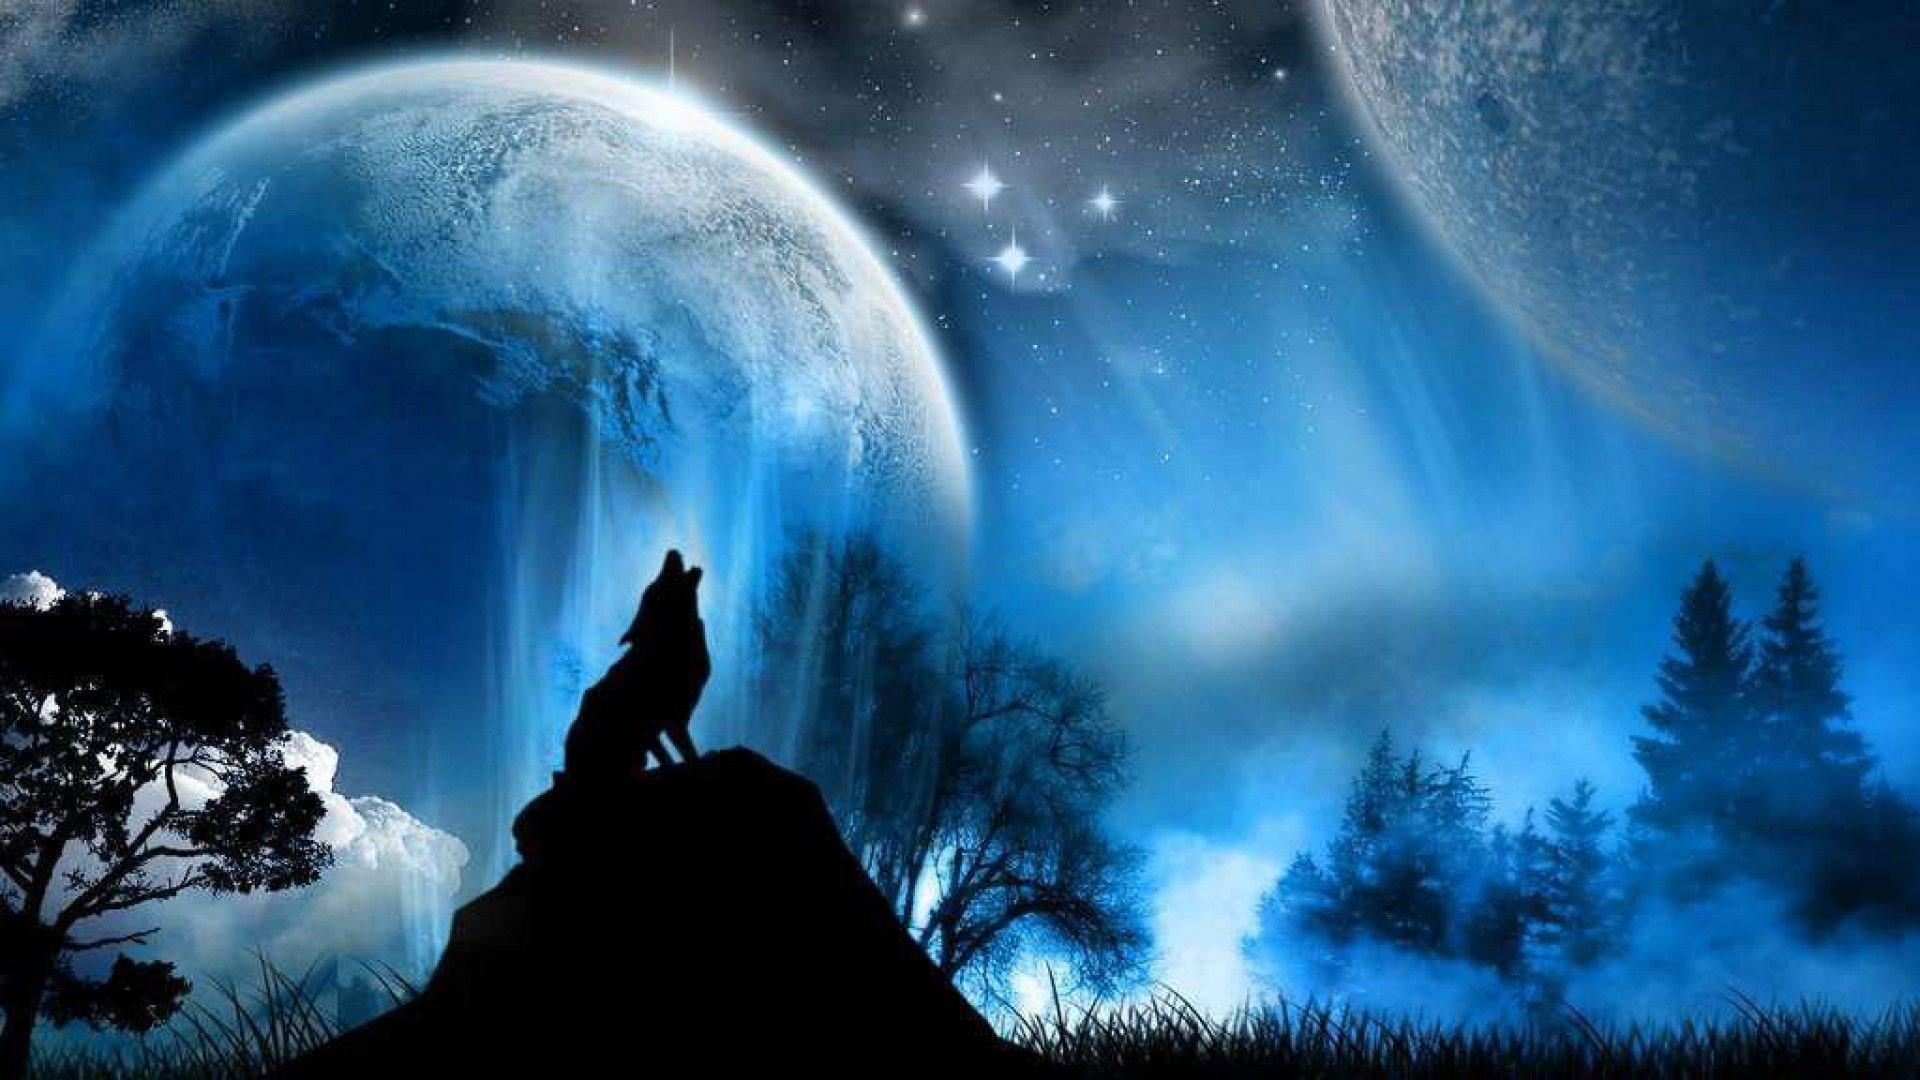 wolf wallpaper hd 1080p